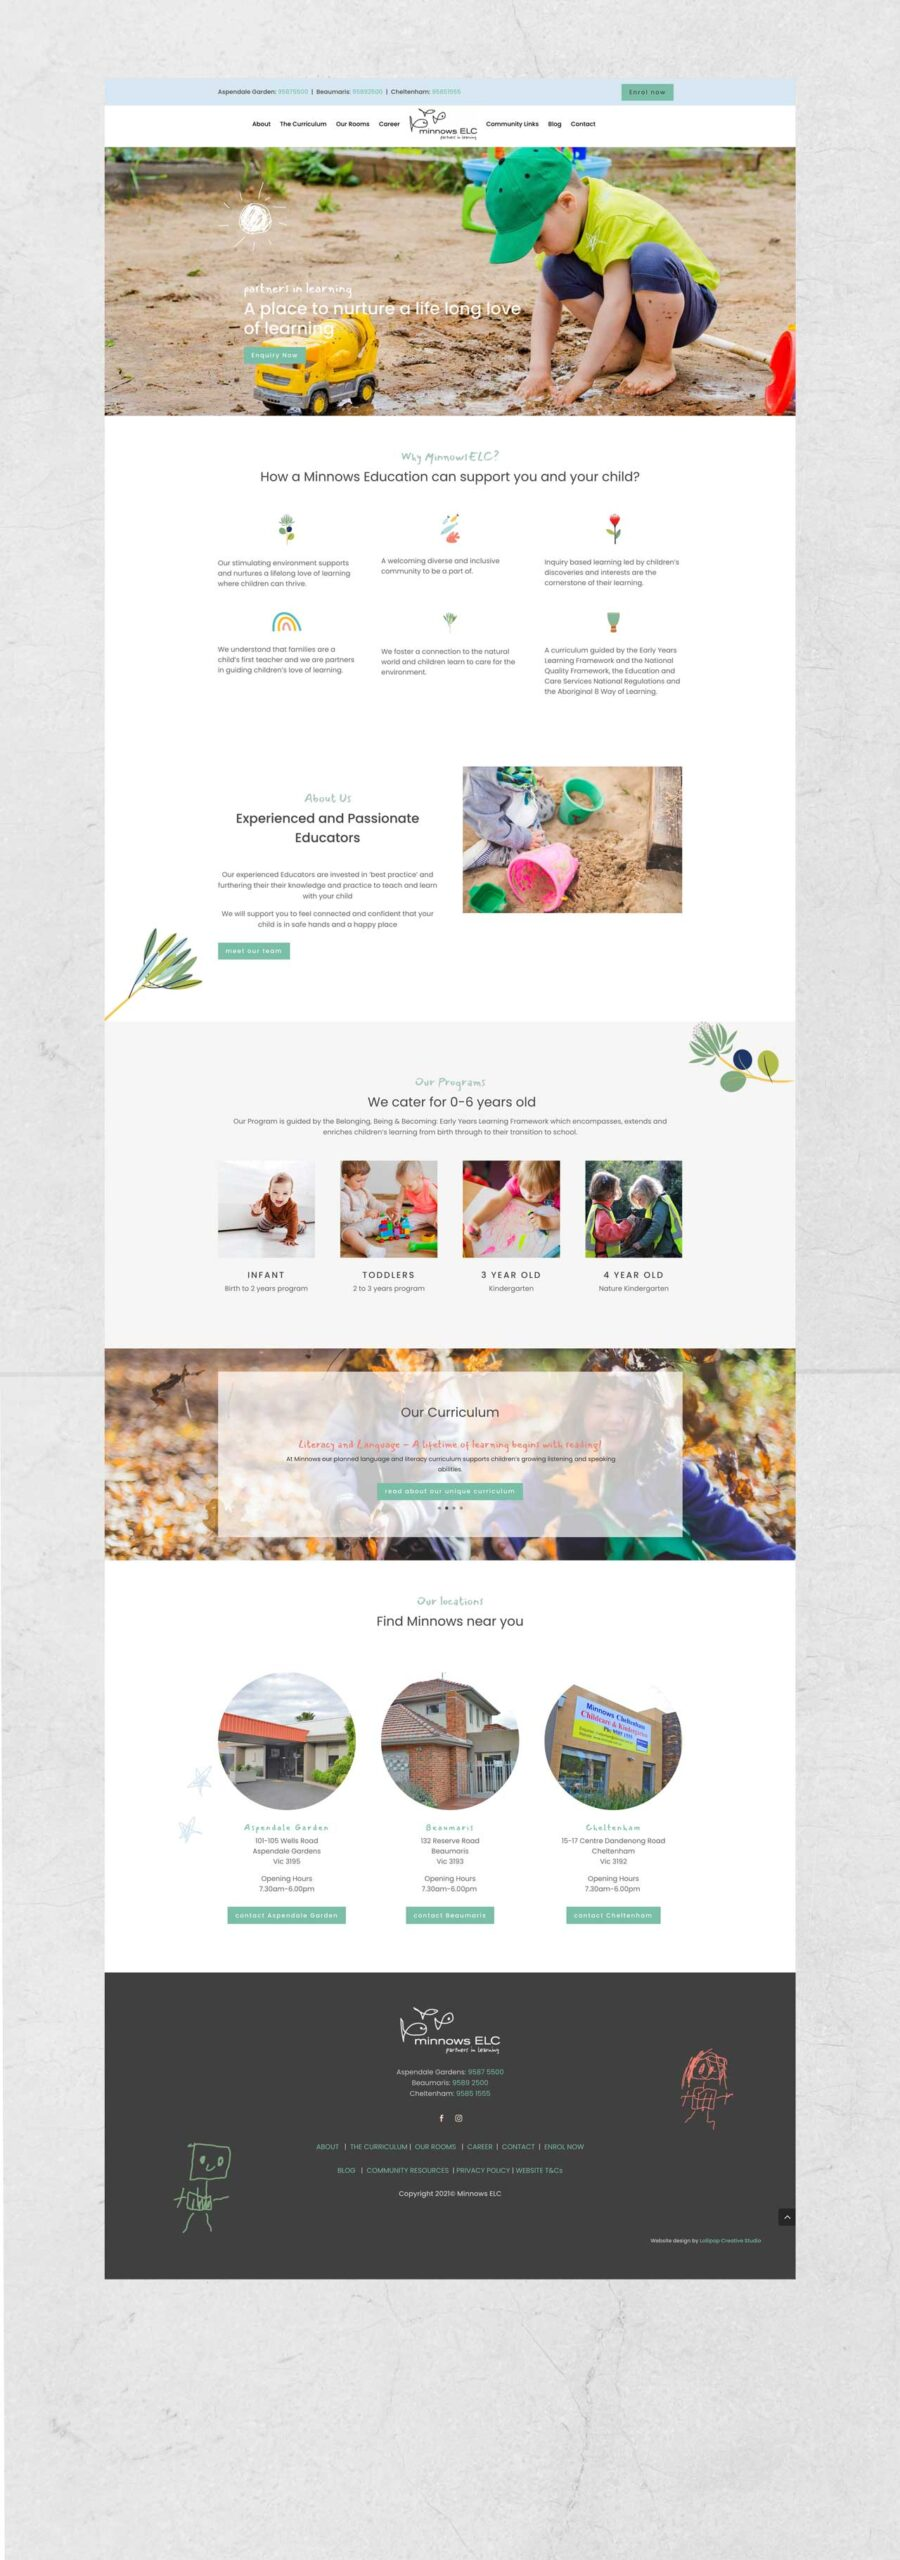 Homepage Web Design Elc Childcare Minnows 02